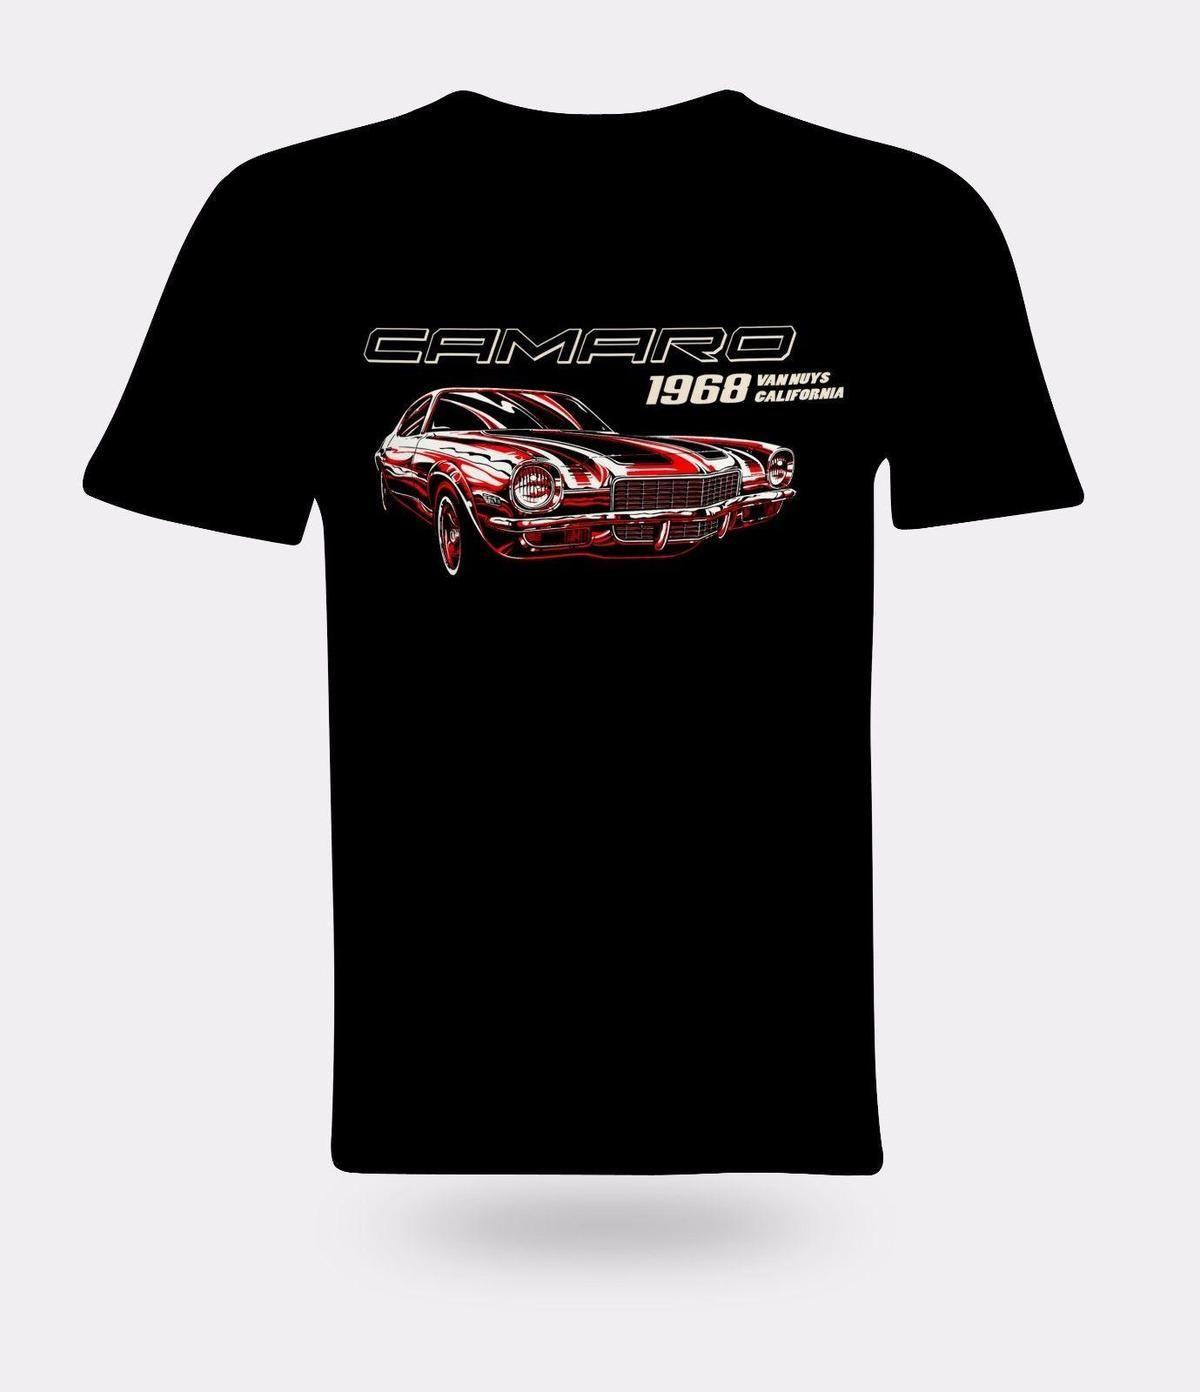 88200362 Vintage American Car Chevrolet Camaro 1968 Black Men Printed T Shirt Gift  Print T Shirt Hip Hop Tee T Shirt NEW ARRIVAL T Shirt Making T Shirts For  Sale ...